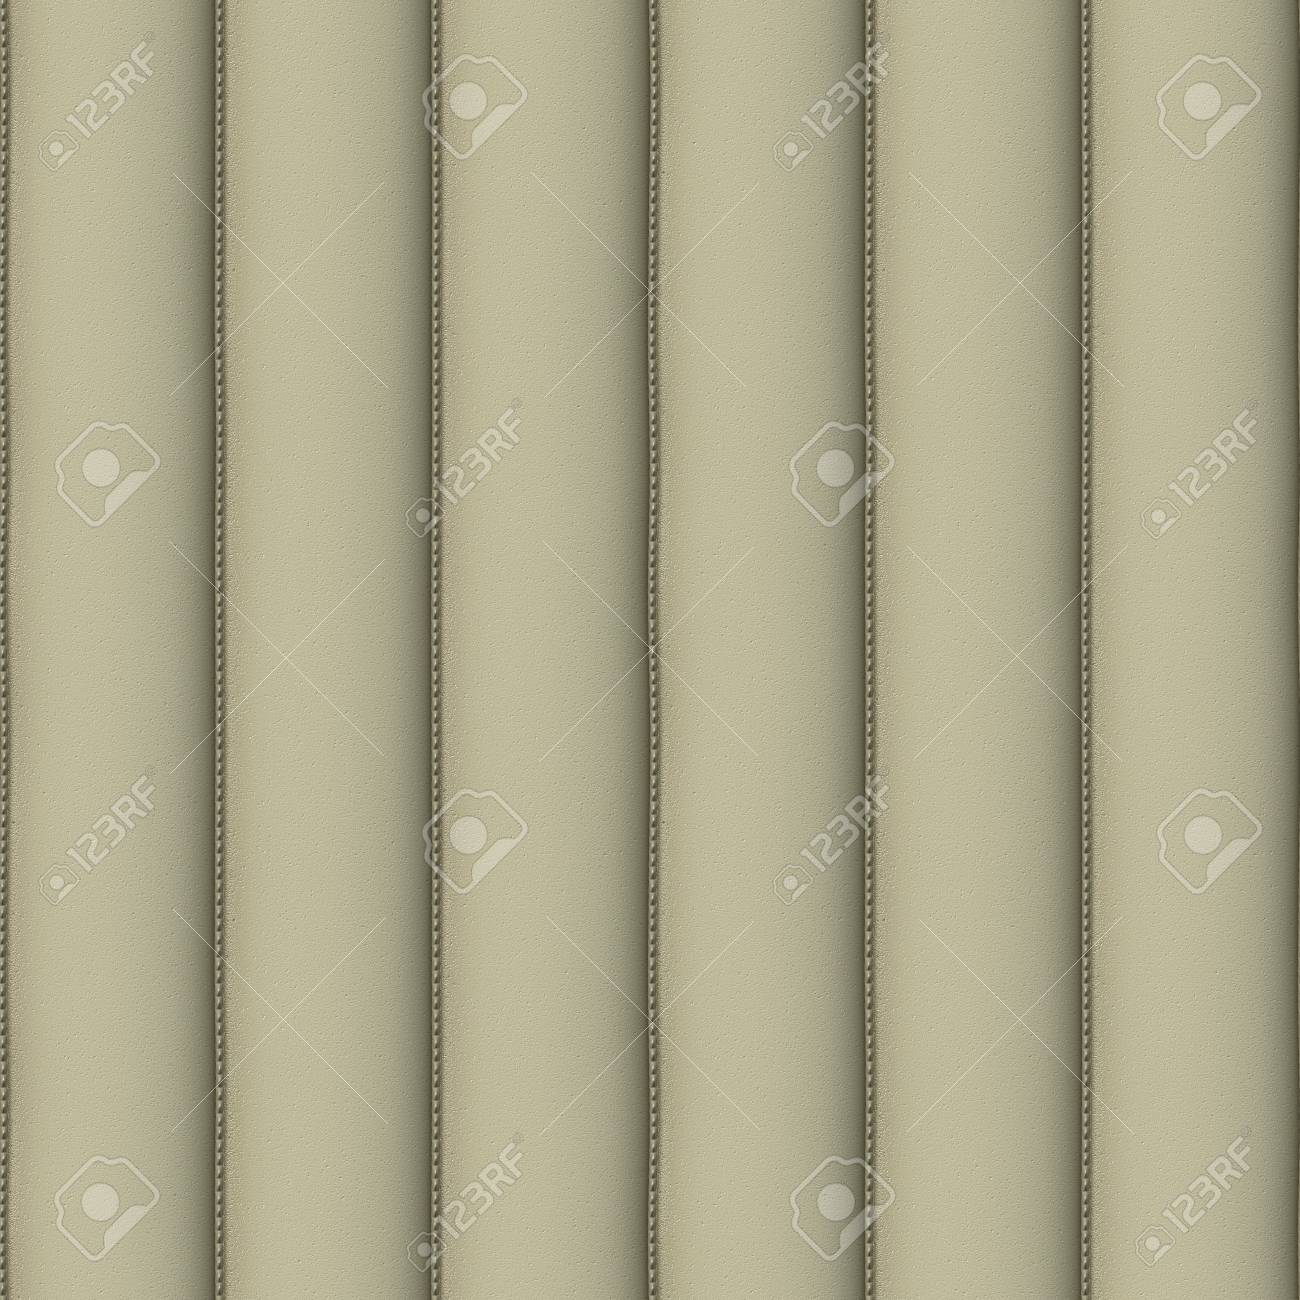 Cream Upholstery Leather Seamless Pattern - Hyper Realistic Illustration Stock Illustration - 12941156